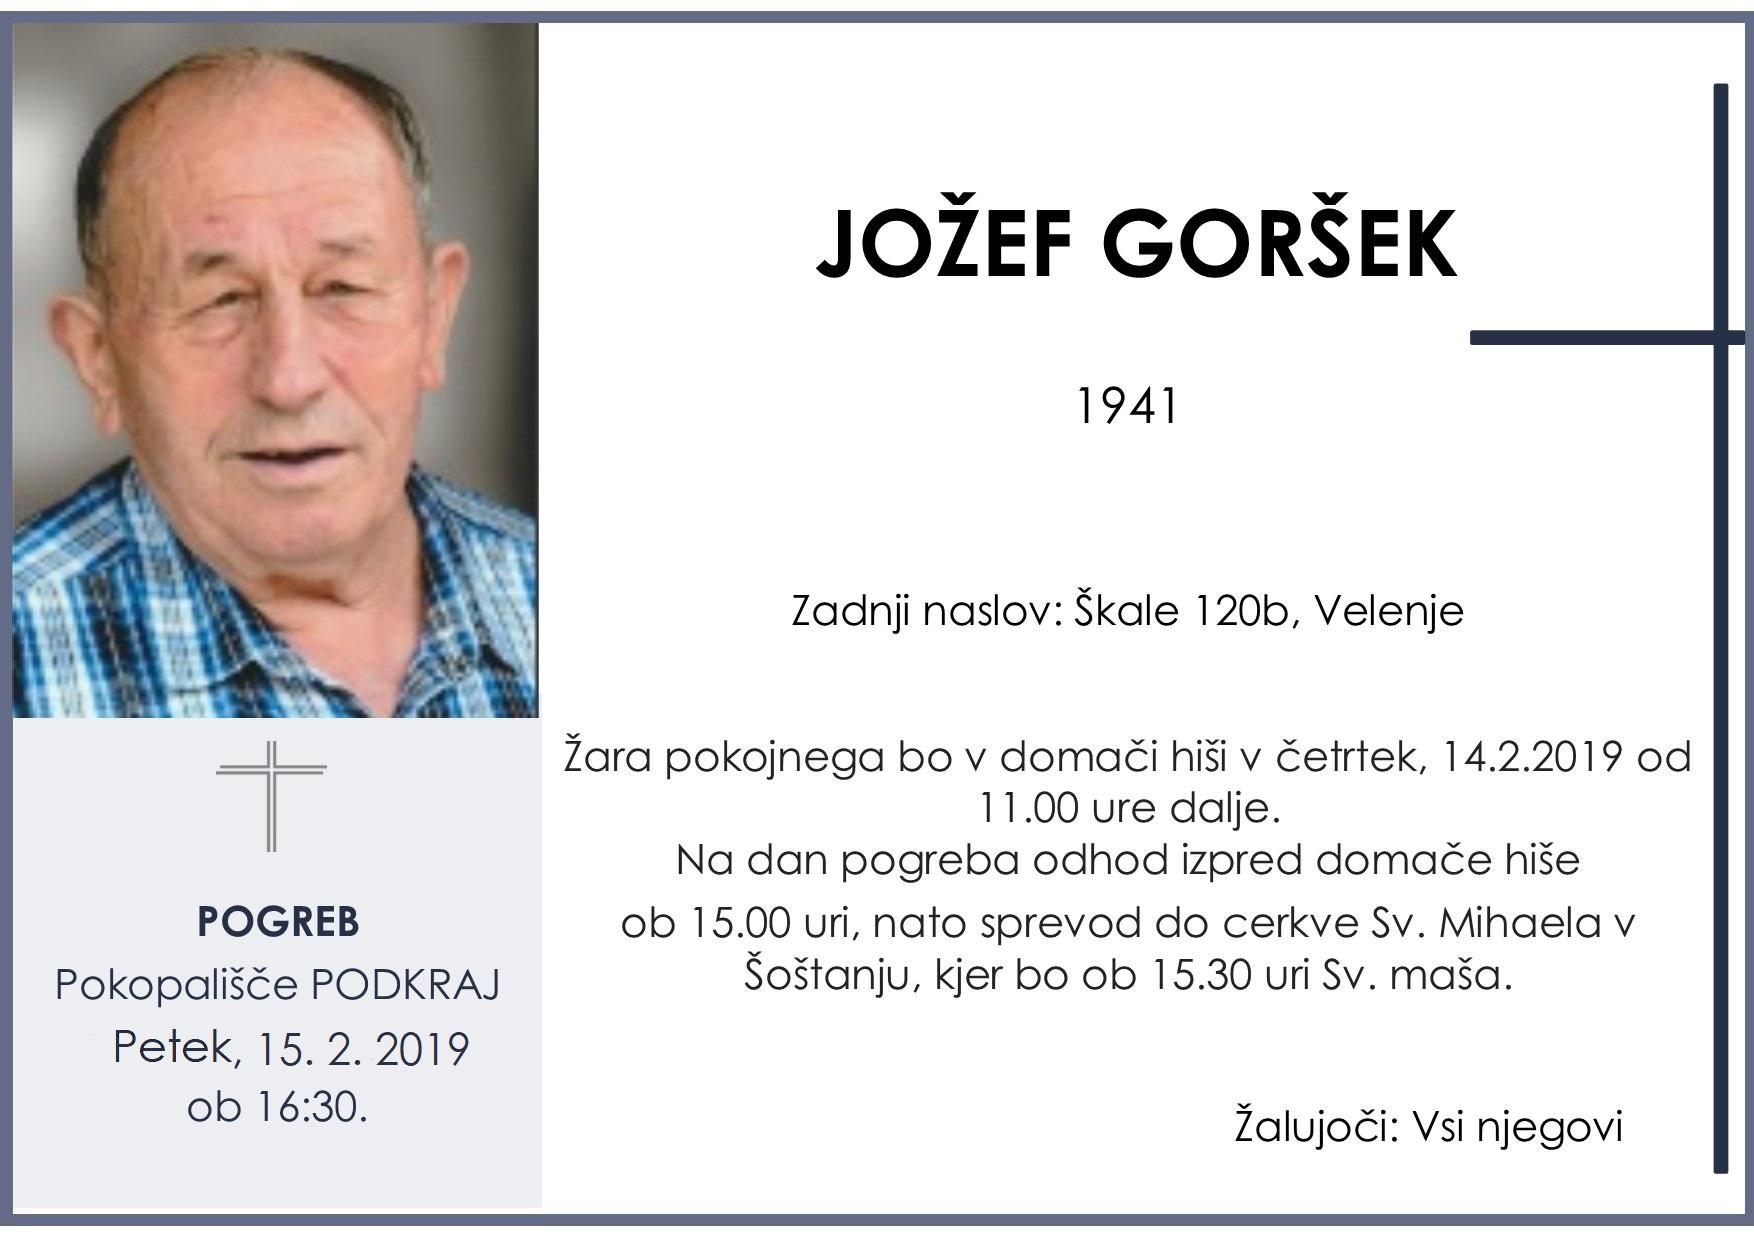 JOŽEF GORŠEK, Podkraj, 15. 02. 2019